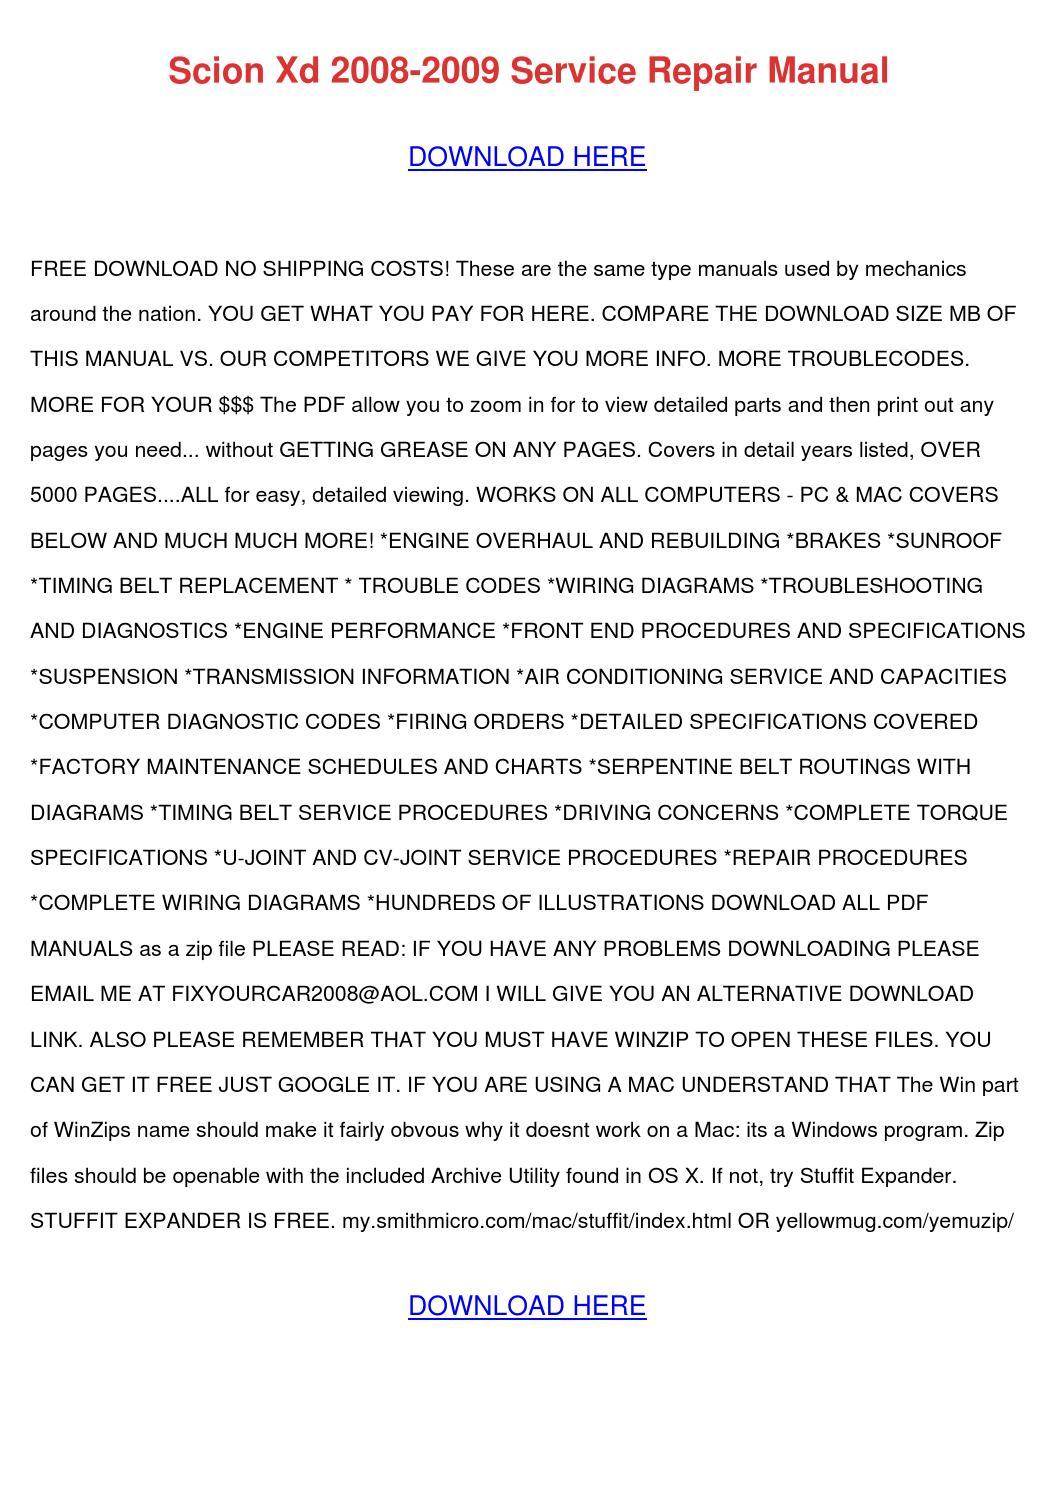 Scion Xd 2008 2009 Service Repair Manual By Emmadarby